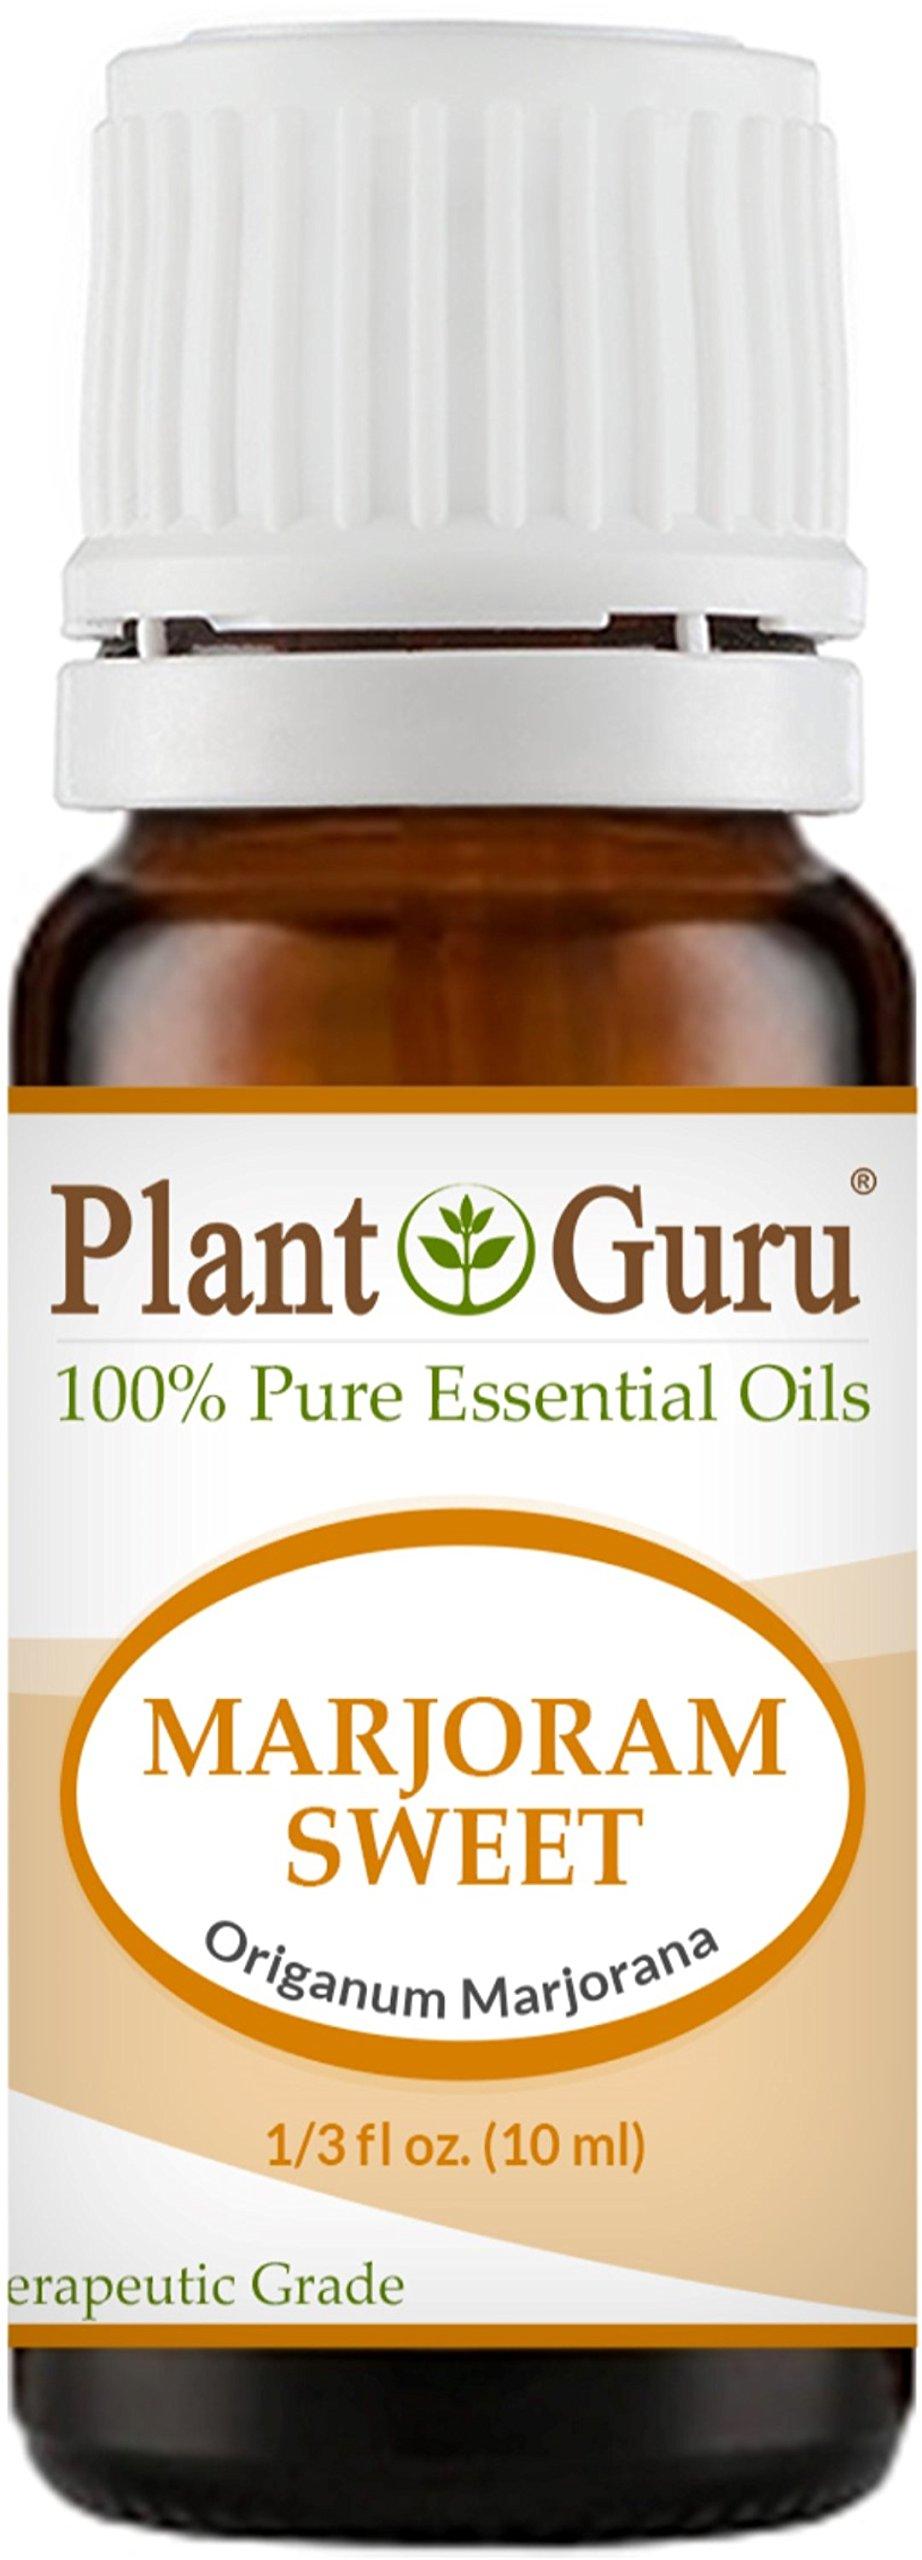 Marjoram Sweet Essential Oil 10 ml. 100% Pure Undiluted Therapeutic Grade.